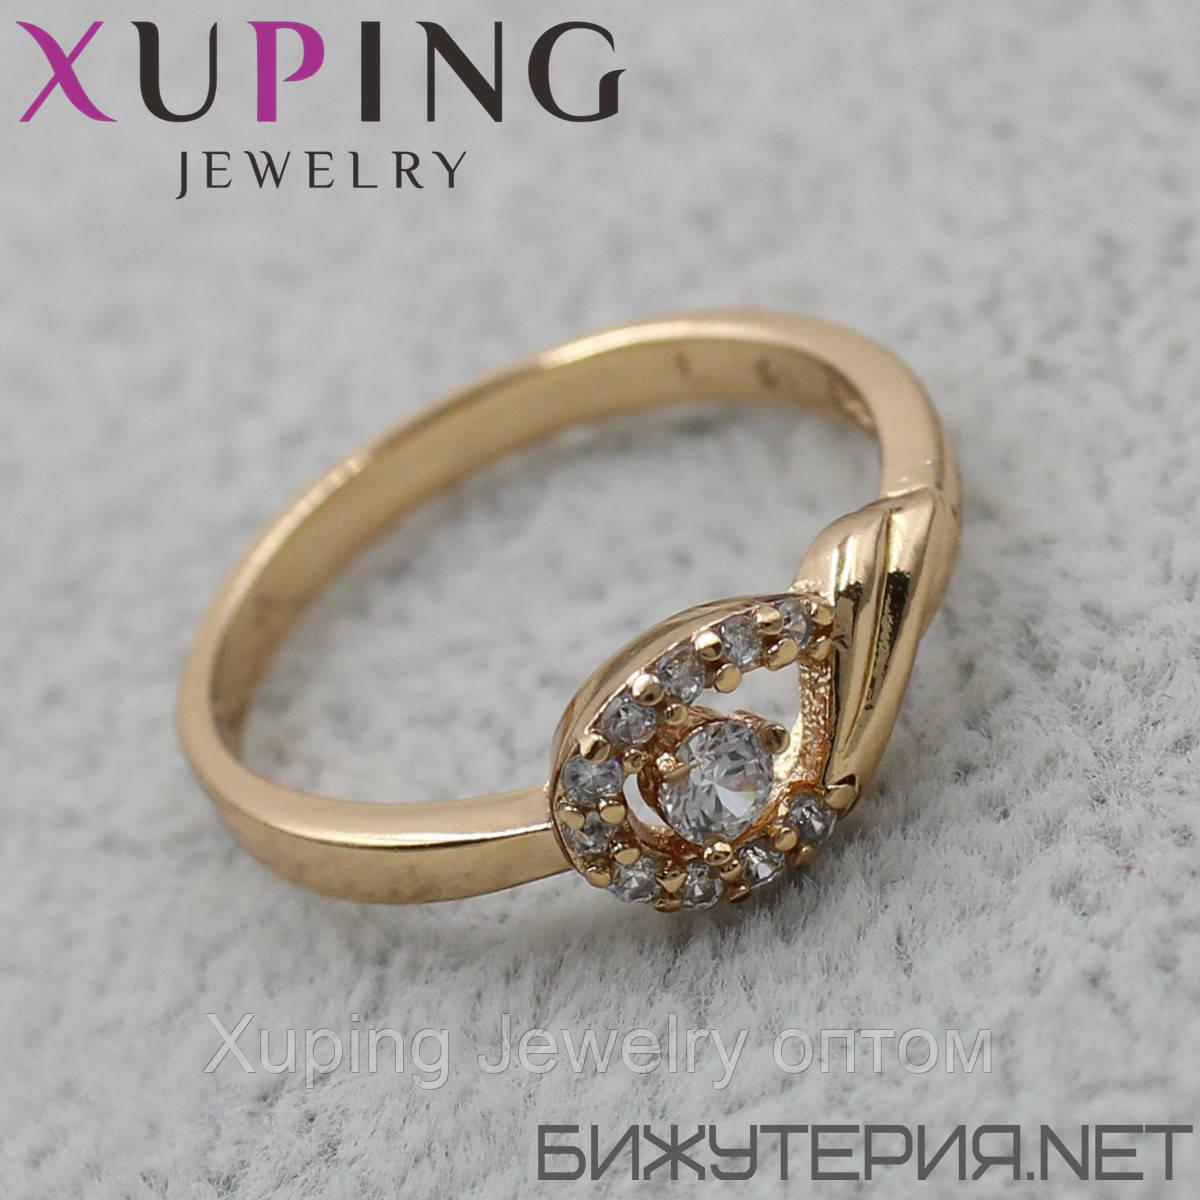 Кольцо Xuping медицинское золото 18K Gold - 1027650697